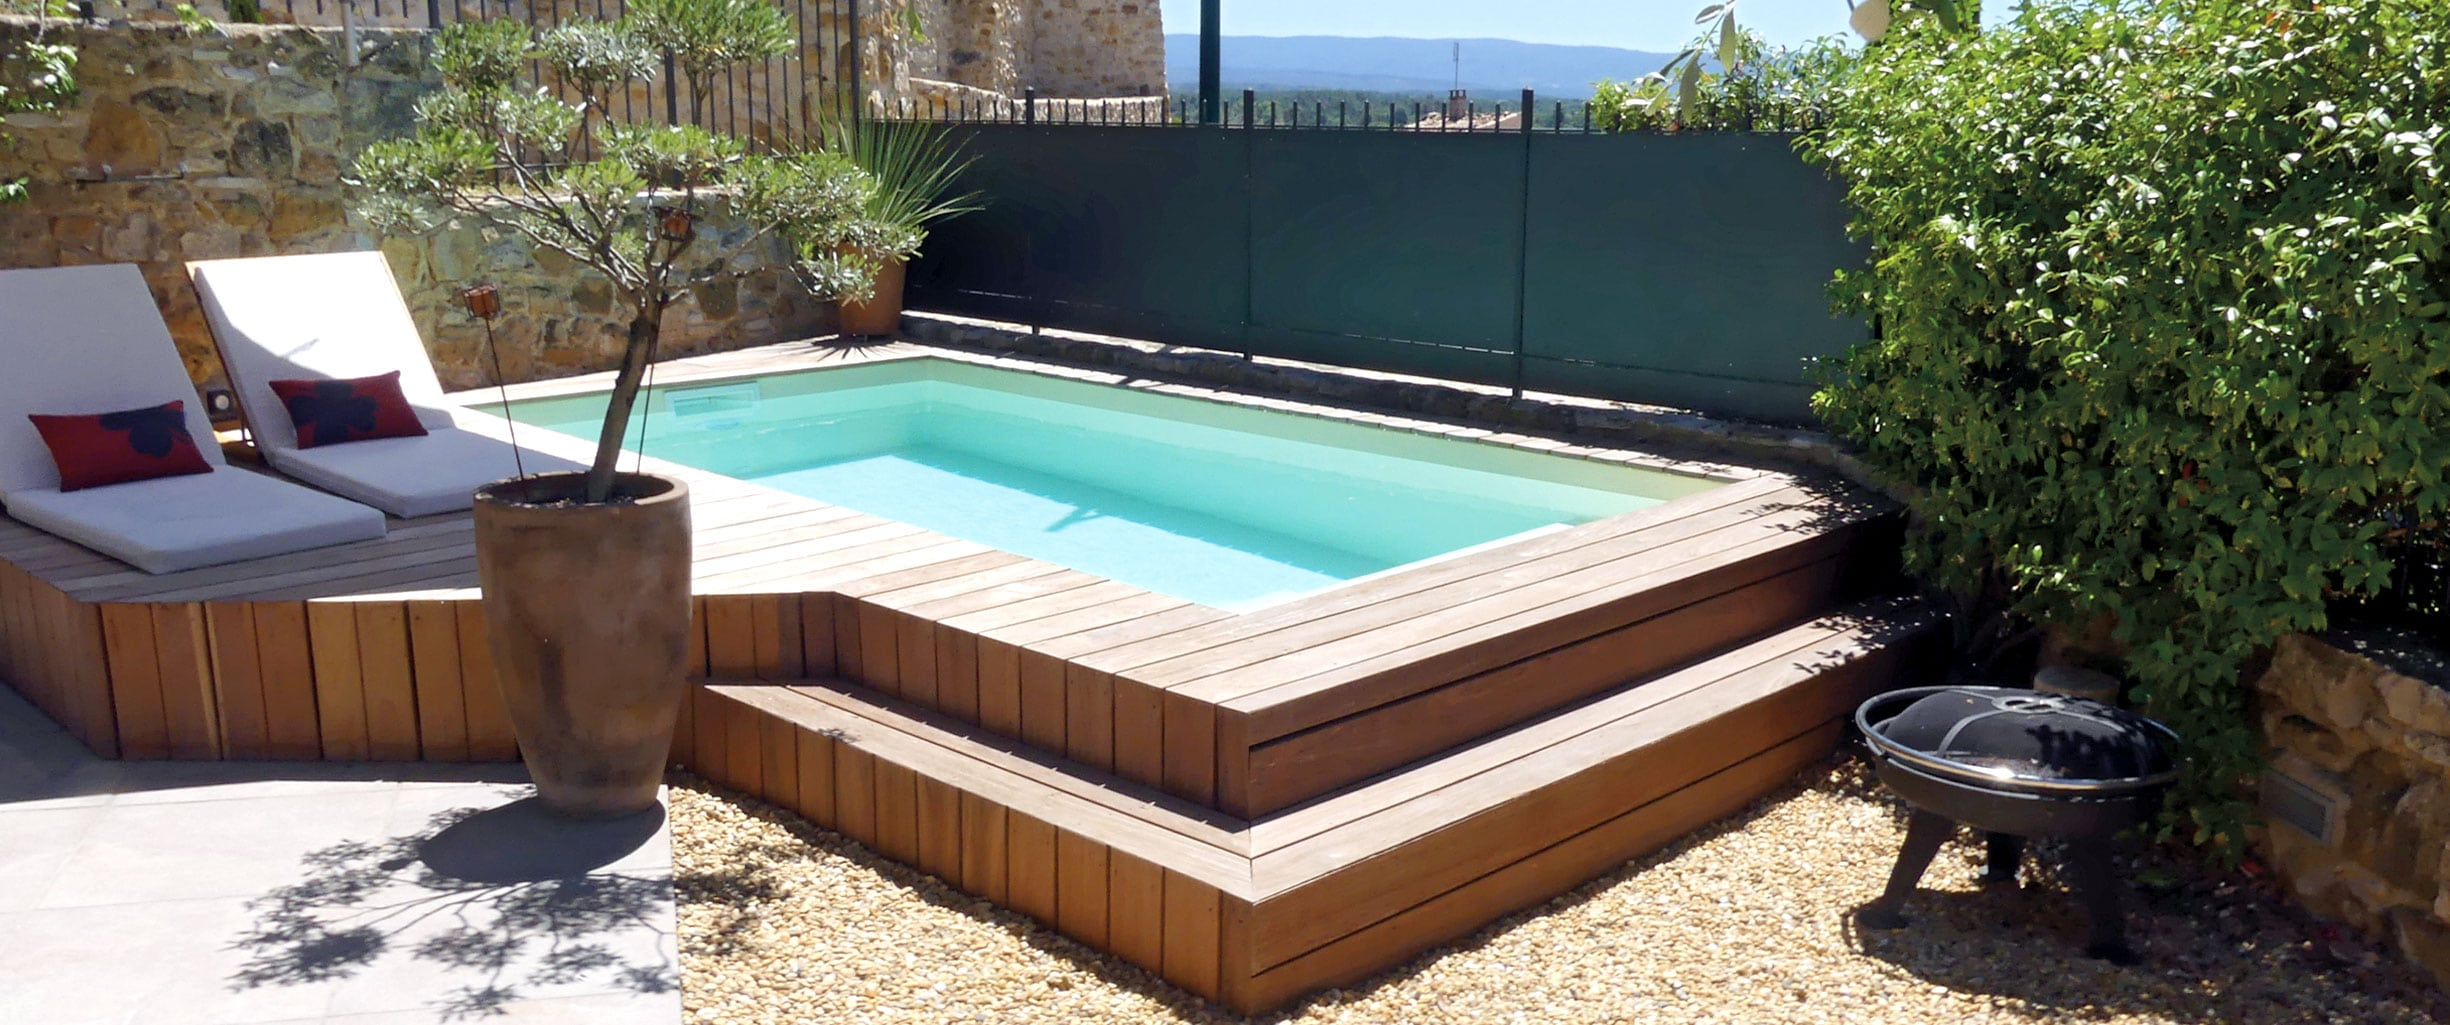 reglementations-piscine-coque_2450x1025px Quelles réglementations  pour les piscines à coque privées ?